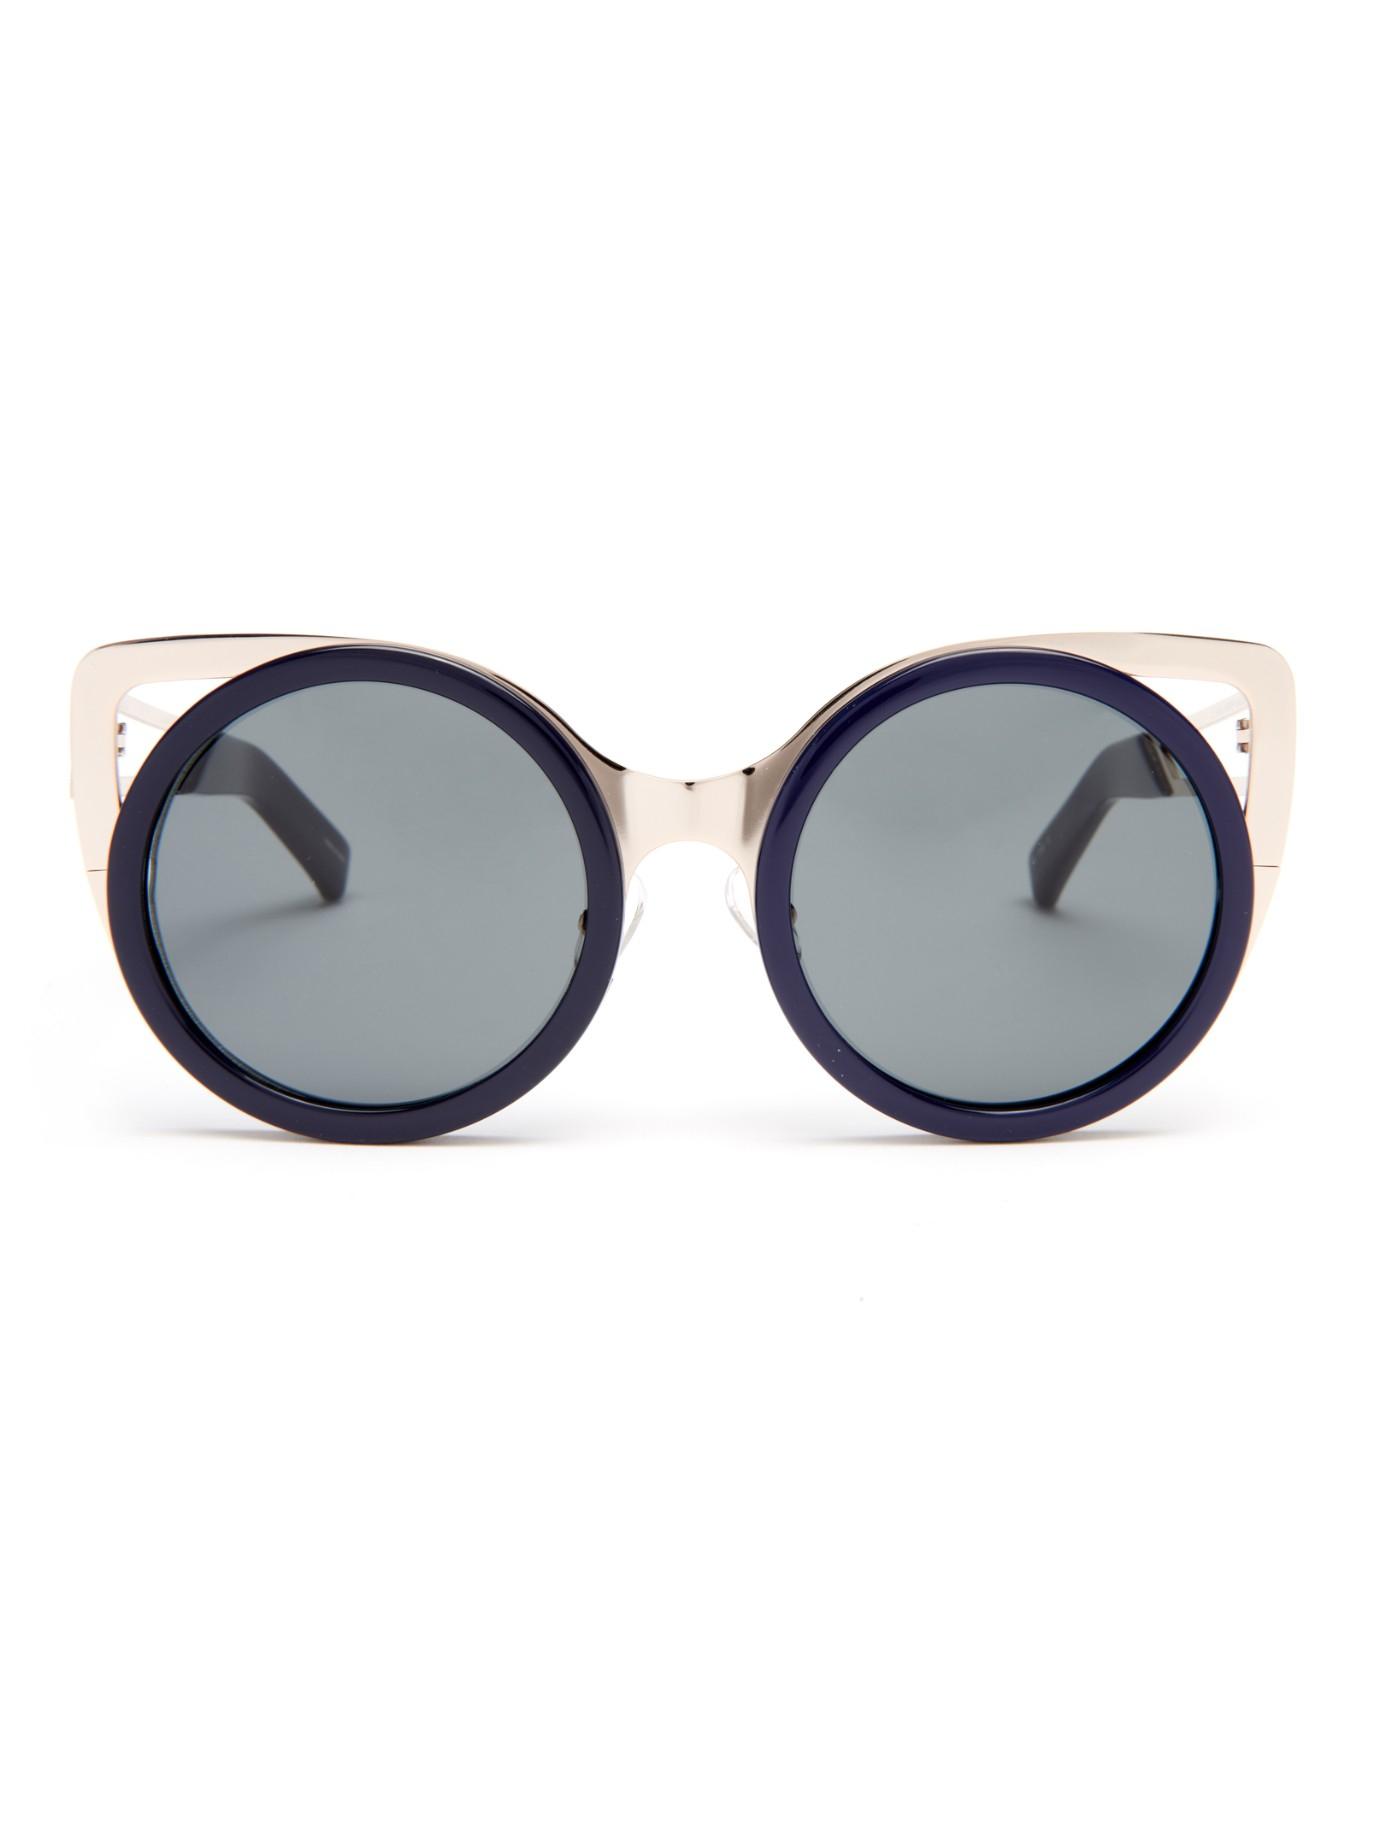 2e191c2740f Erdem X Linda Farrow Cat-eye Sunglasses in Blue - Lyst